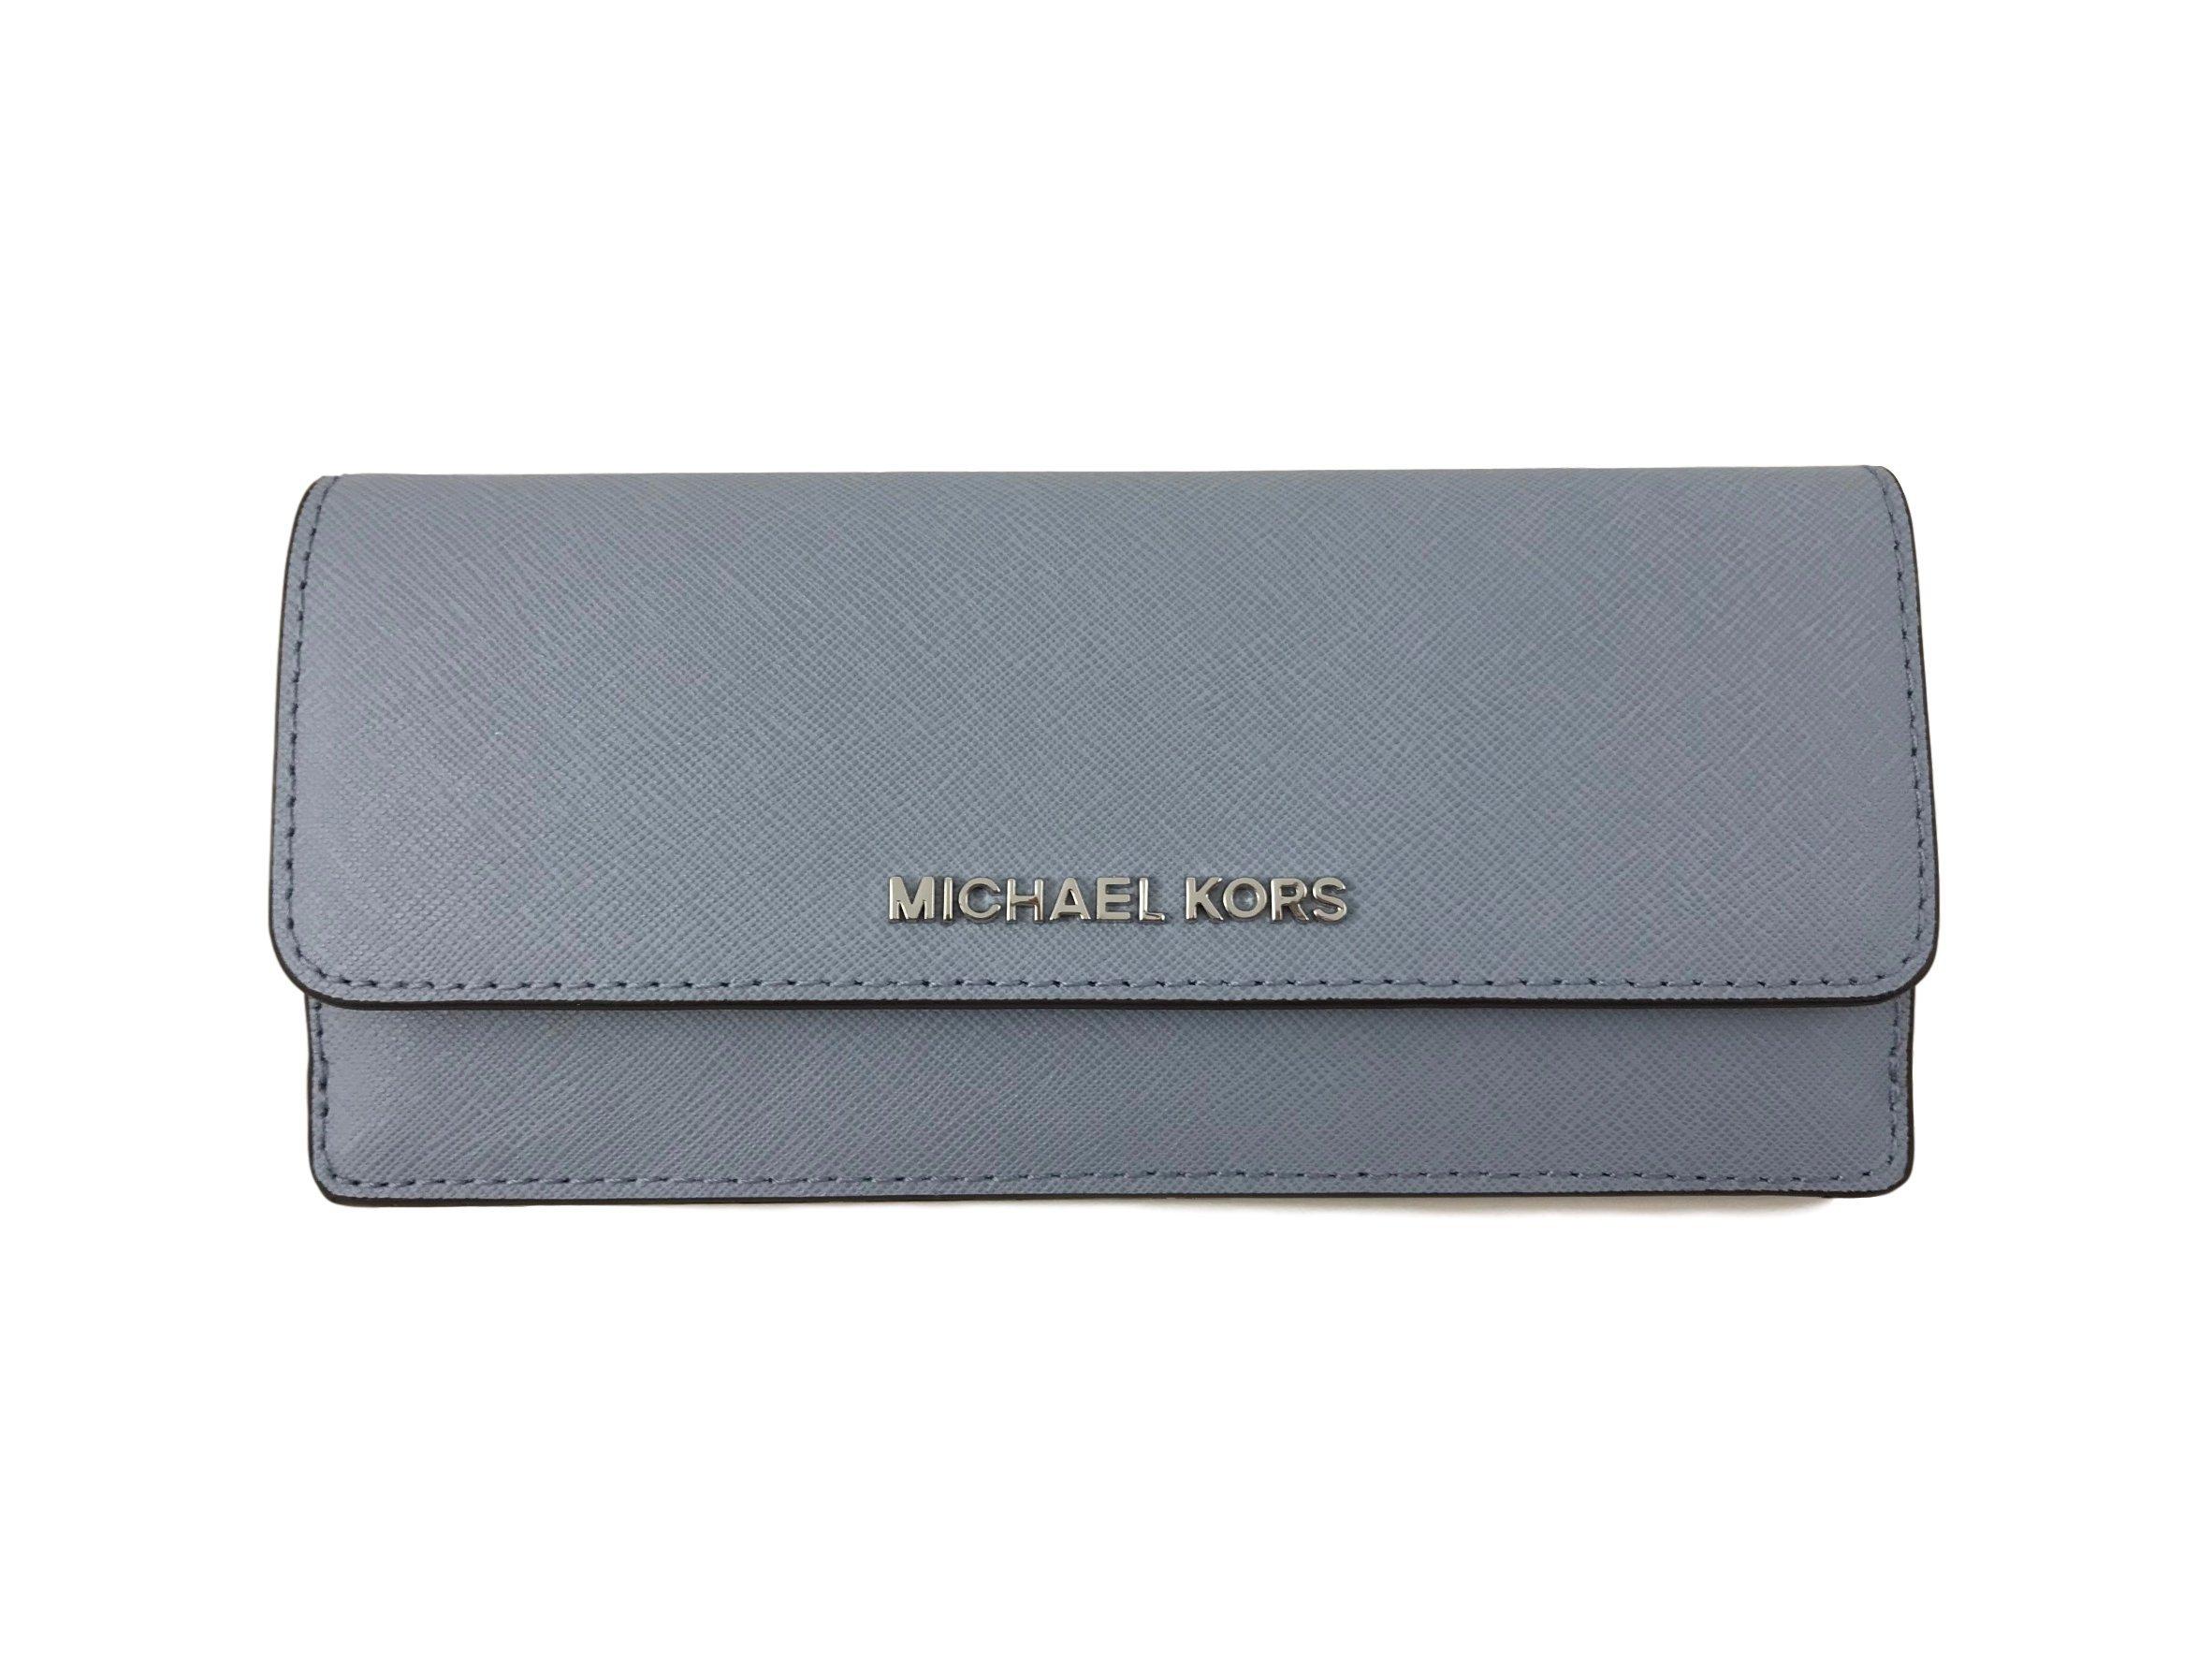 Michael Kors Jet Set Travel Saffiano Leather Slim Flat Wallet in Pale Blue